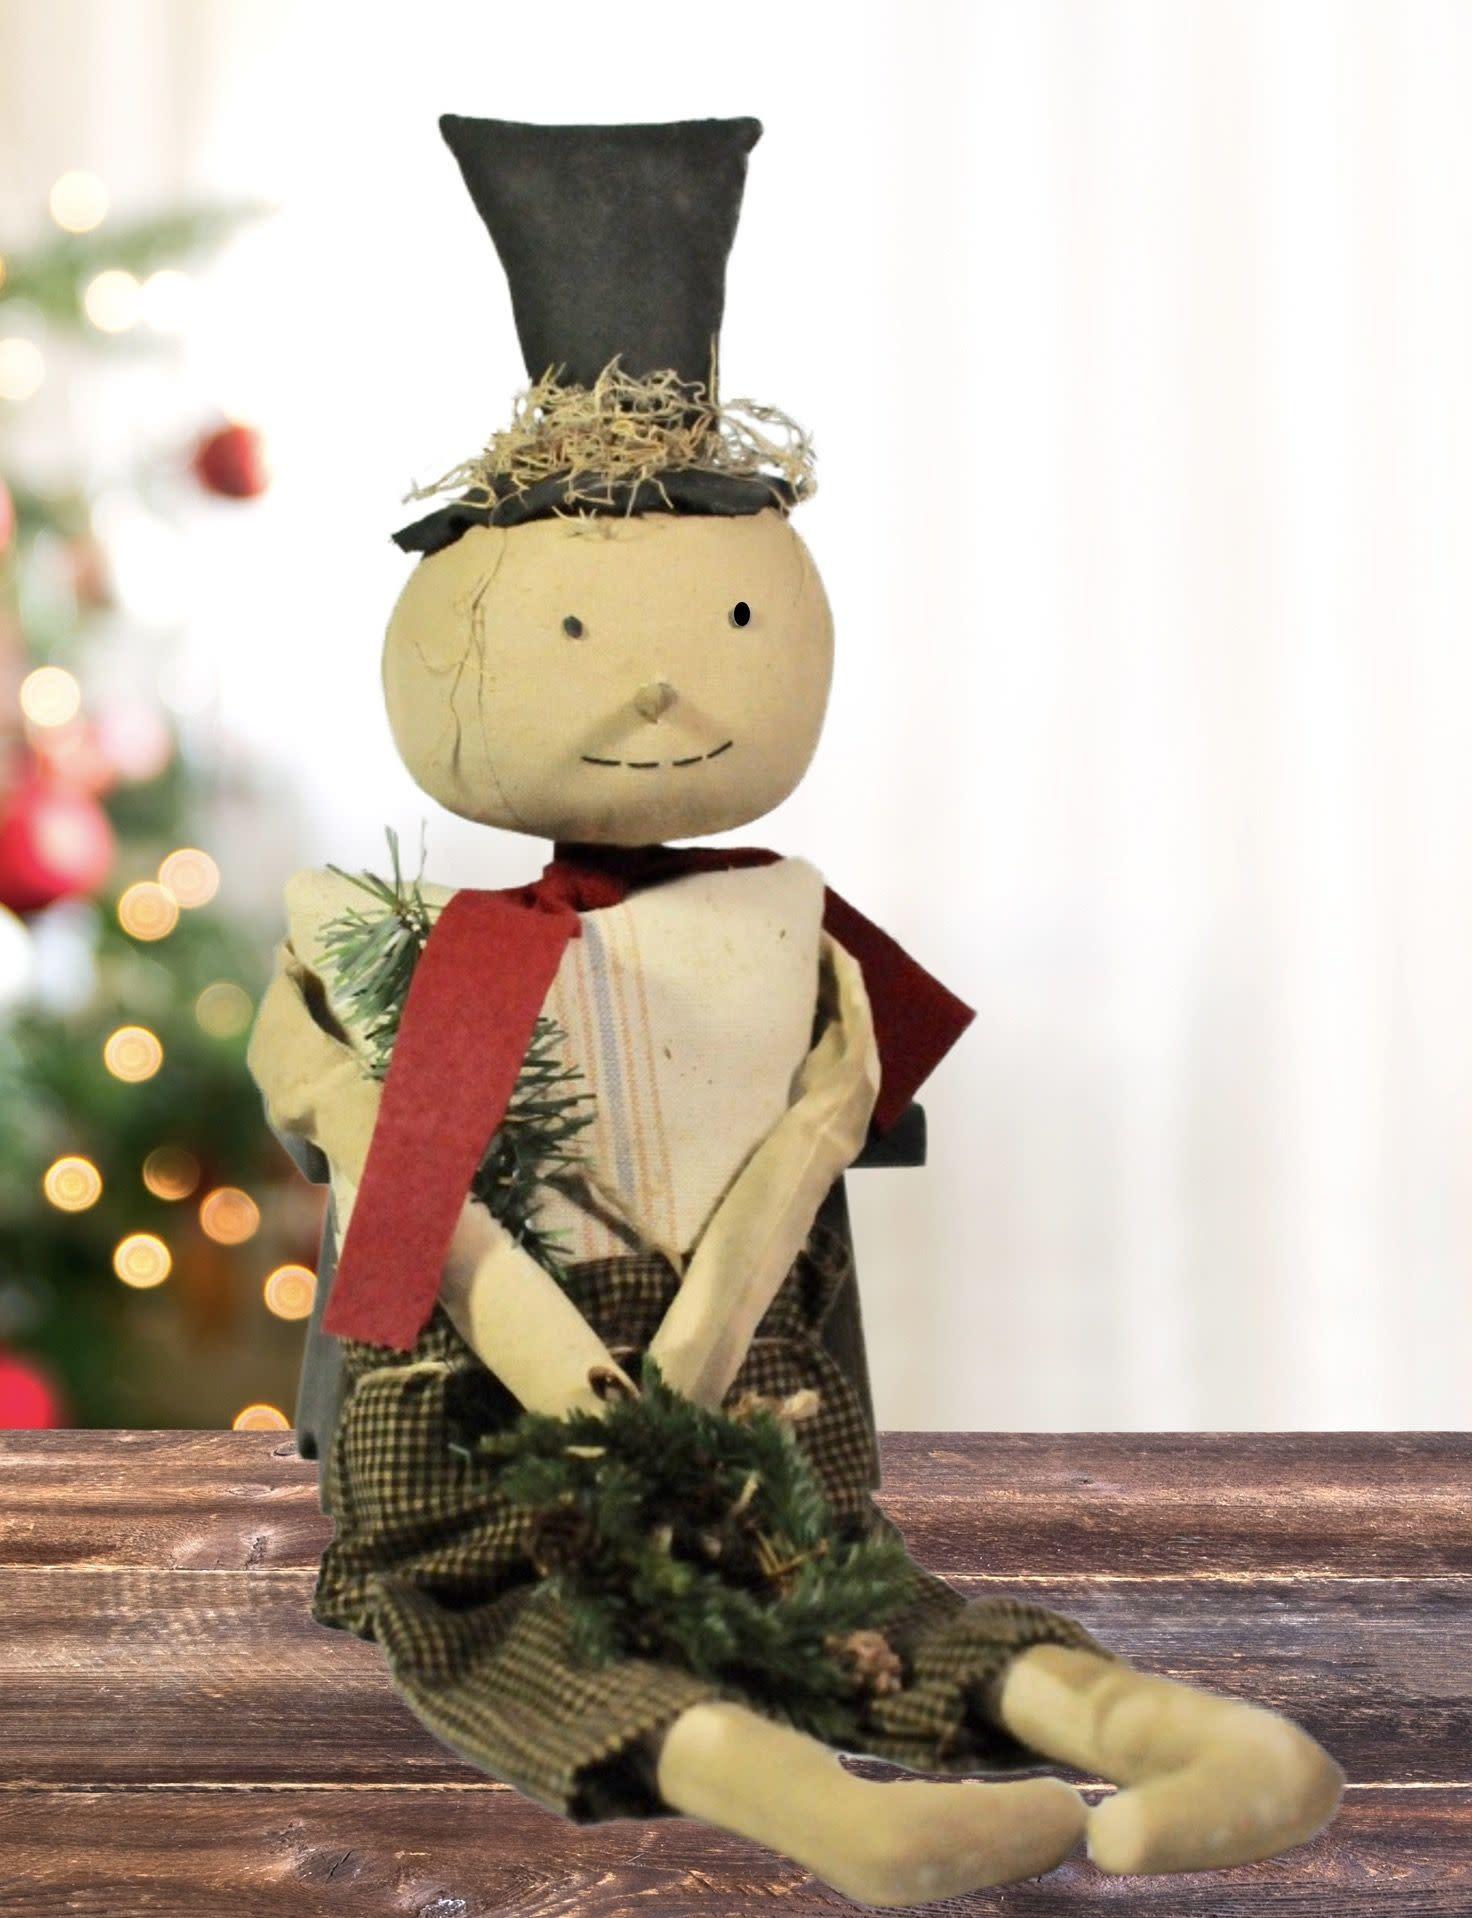 Dawns Attic Treasurers Sitting Snowman Black Check Pants Top Hat Holding Wreath